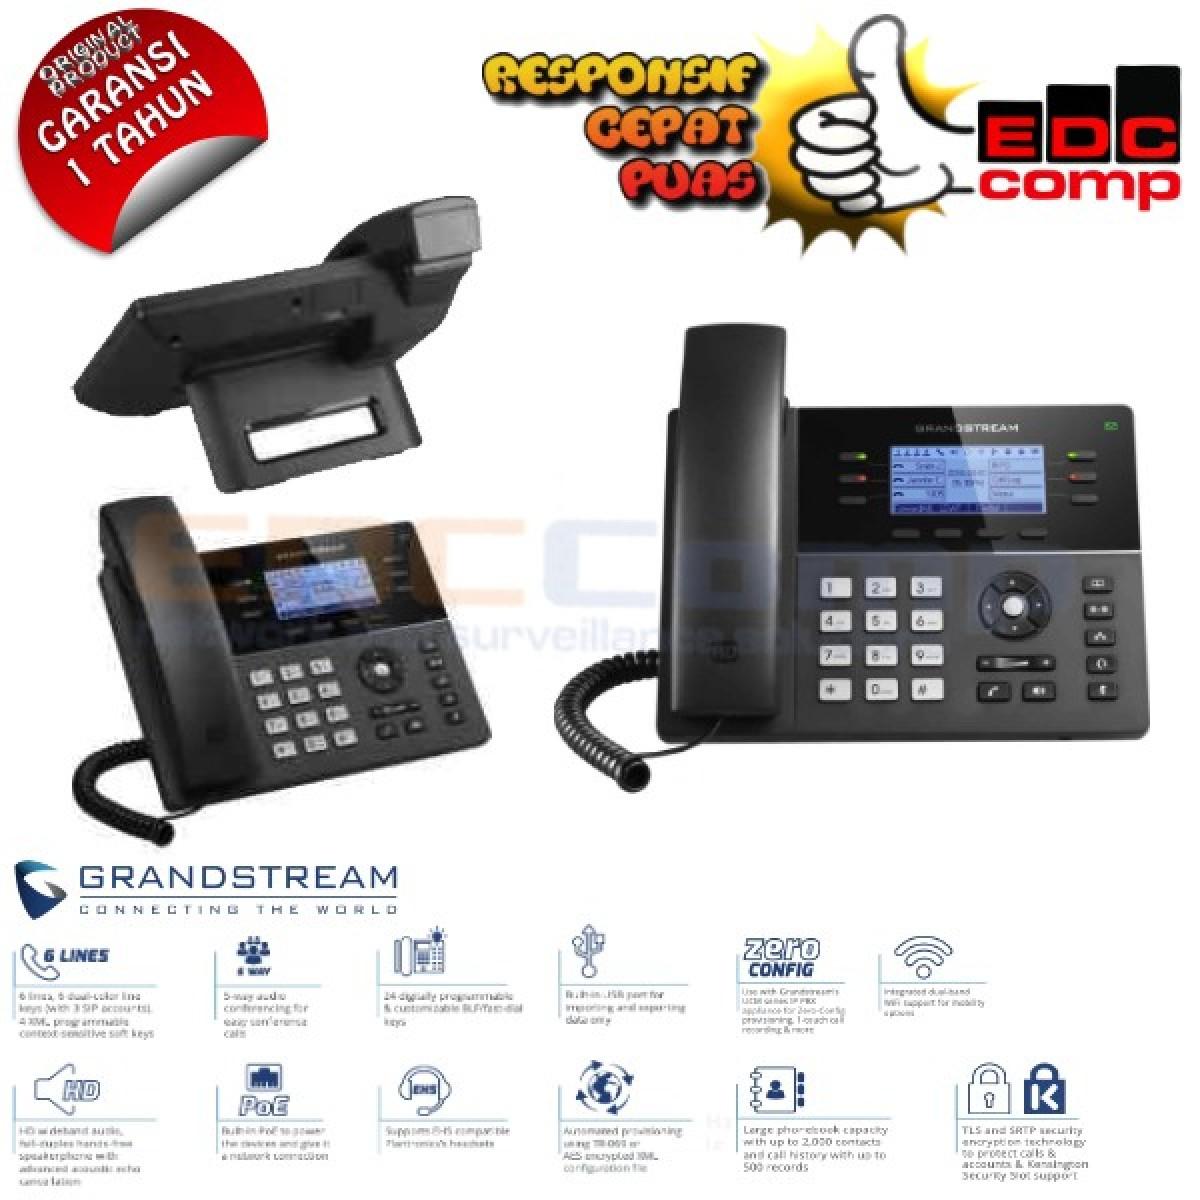 Grandstream GXP1760W HD IP Phone with WiFi   GXP1760W Grandstream - EdcComp